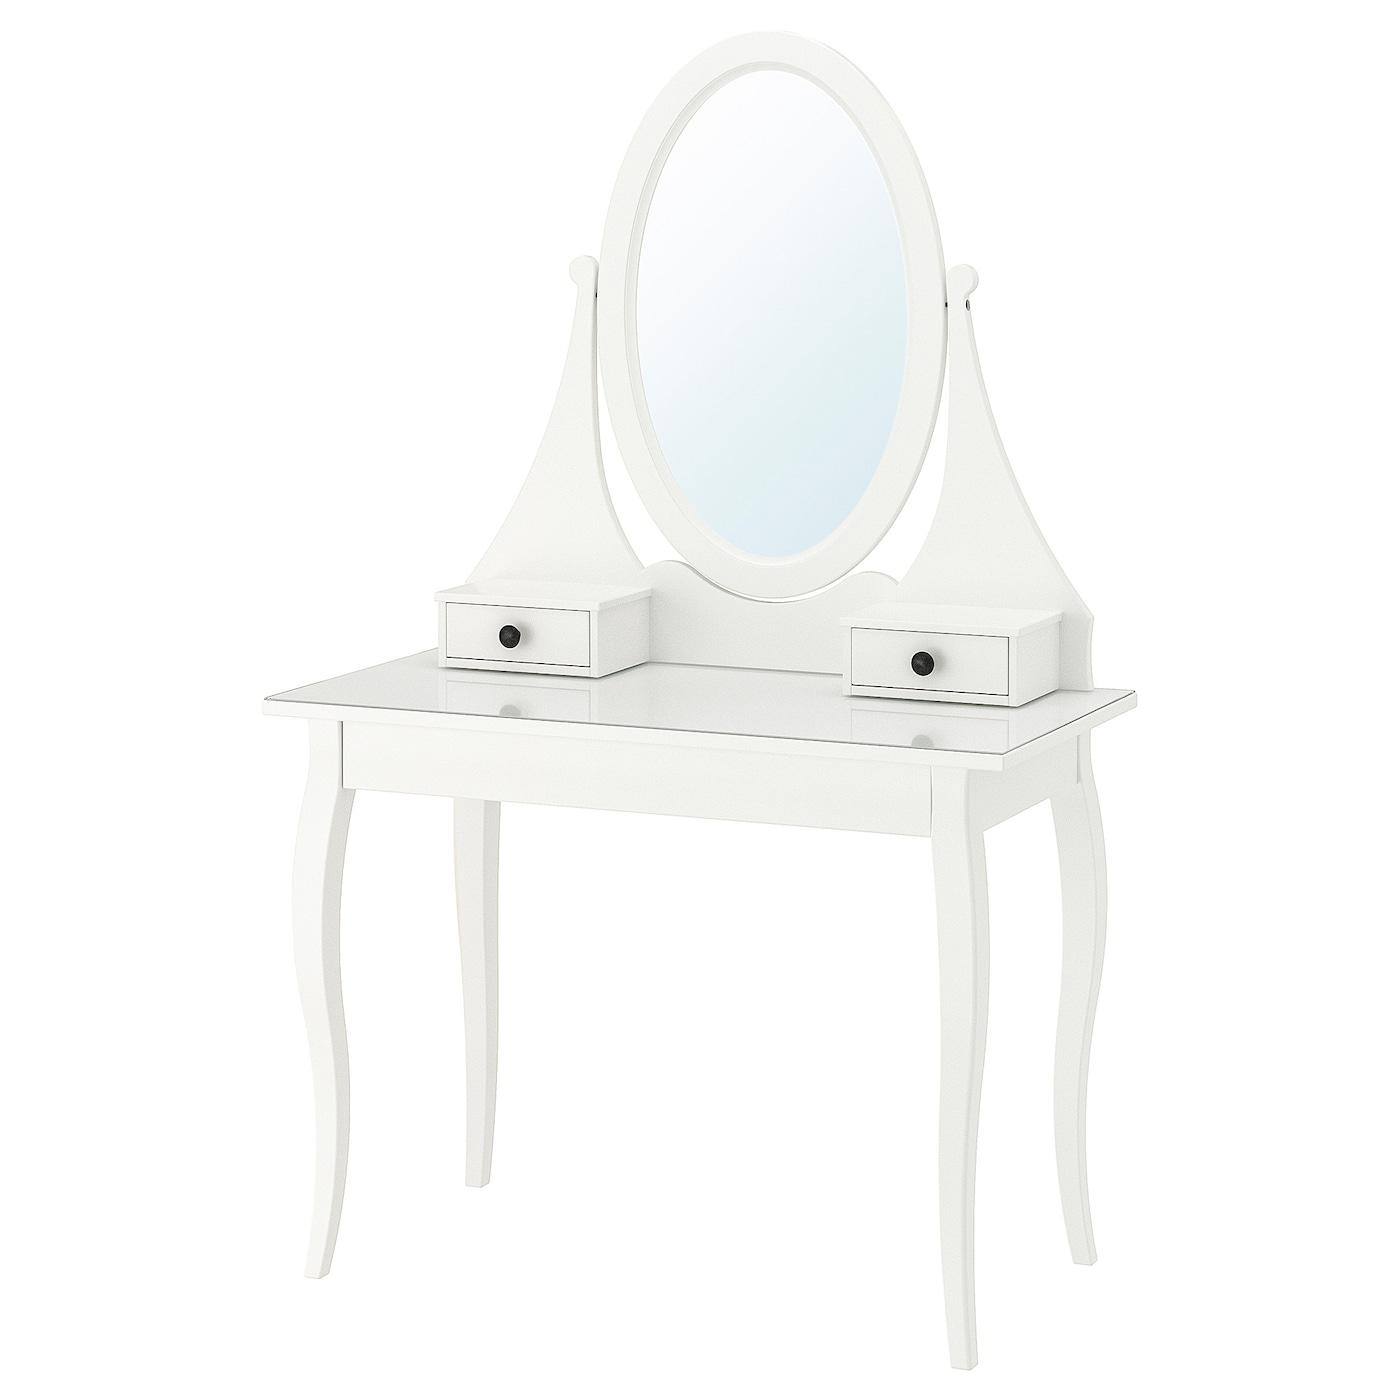 HEMNES Dressing table with mirror - white 5x5 cm